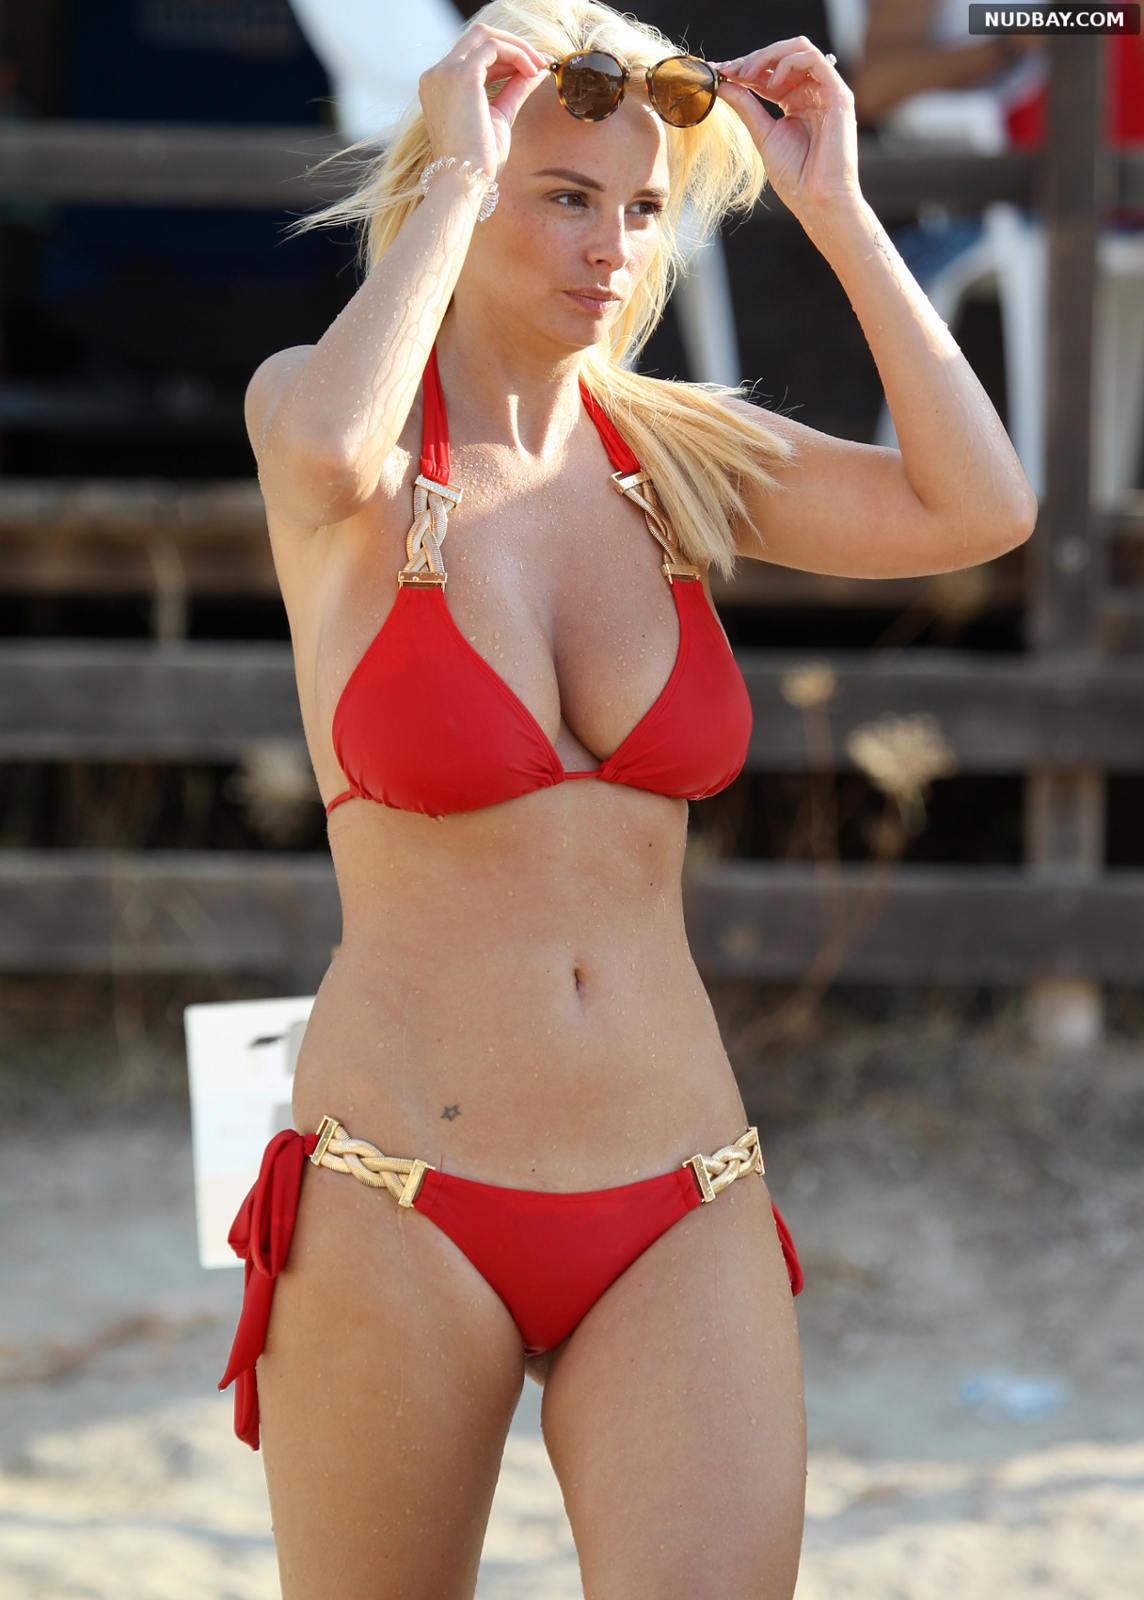 Rhian Sugden Red Bikini on the Beach in Ibiza Sep 11 2016